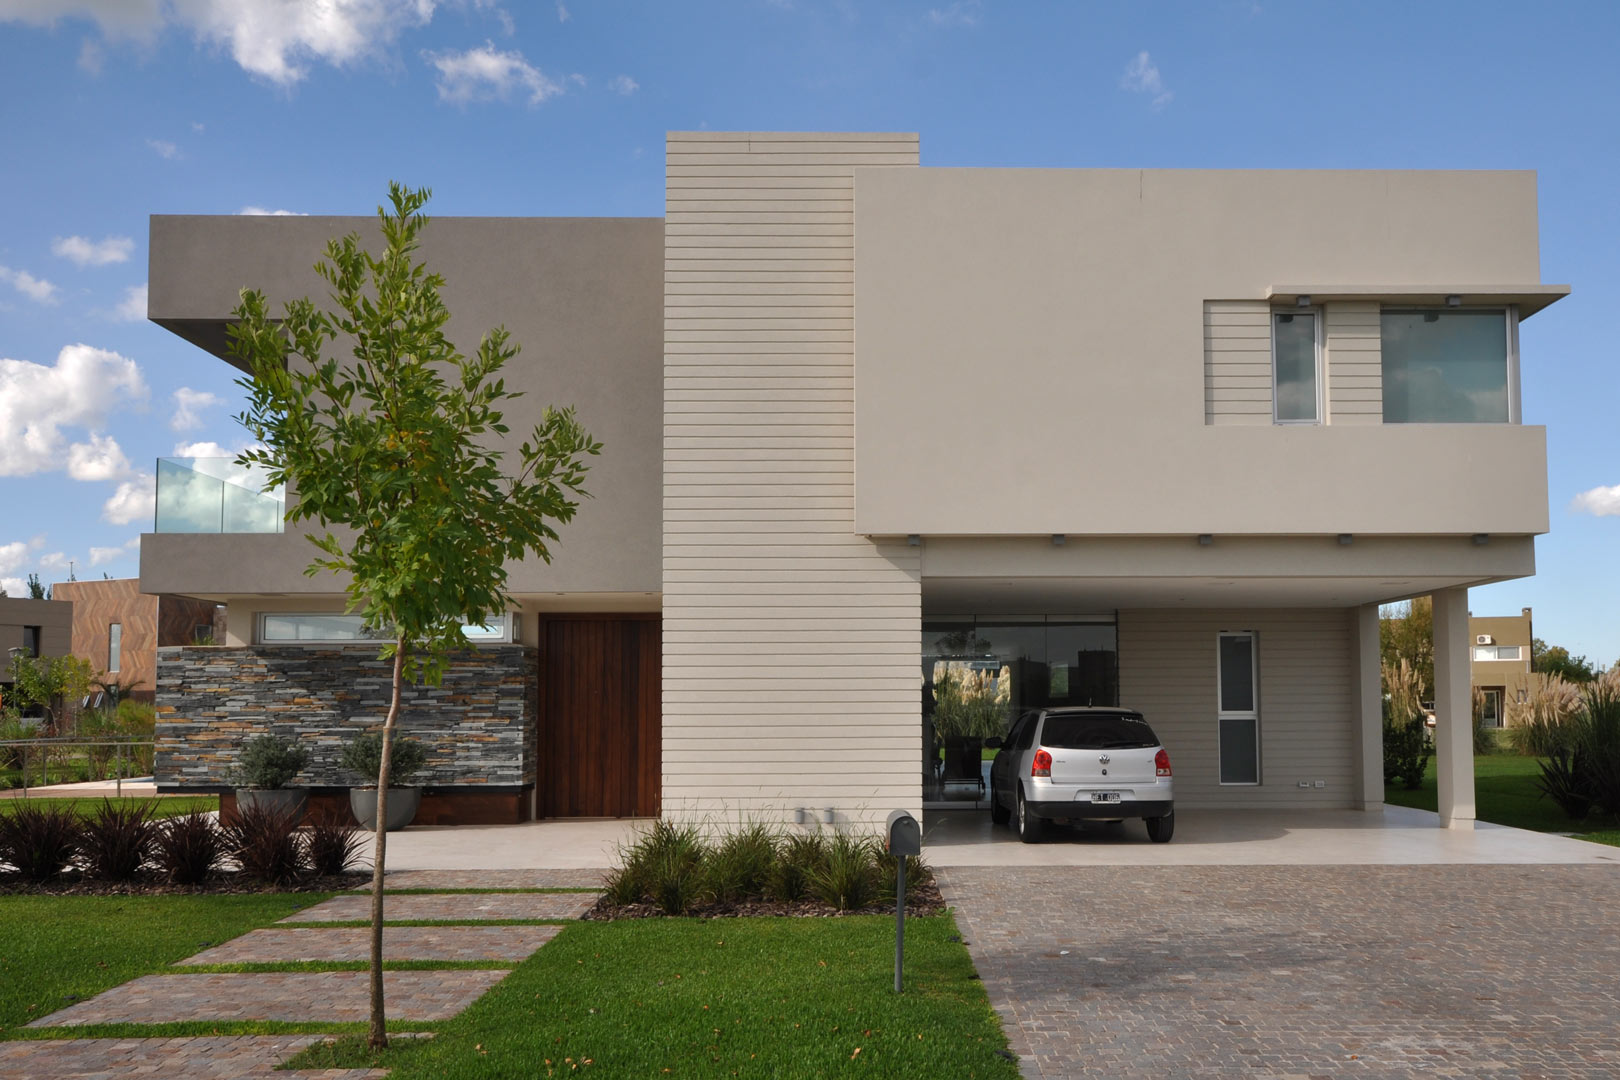 Galeria fotos alberto gonz lez arquitectos casa - Fotos de recibidores de casas ...